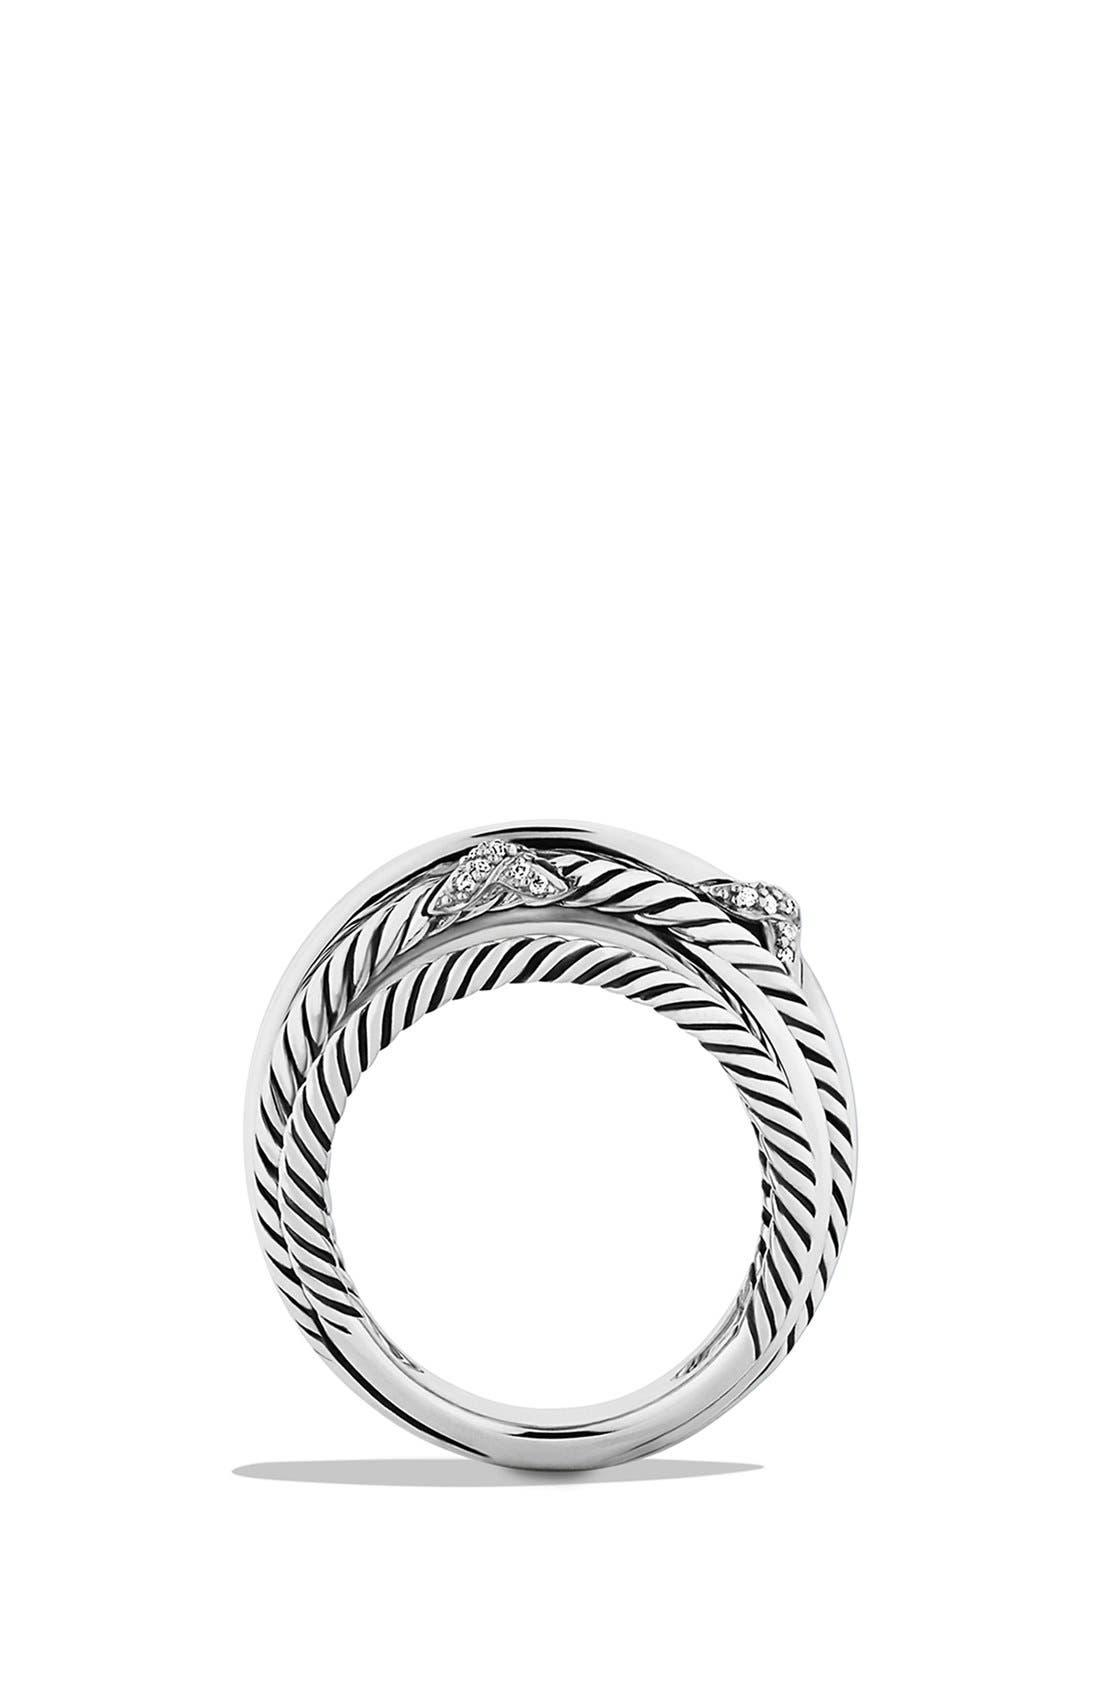 Alternate Image 2  - David Yurman 'Three X Crossover' Ring with Diamonds